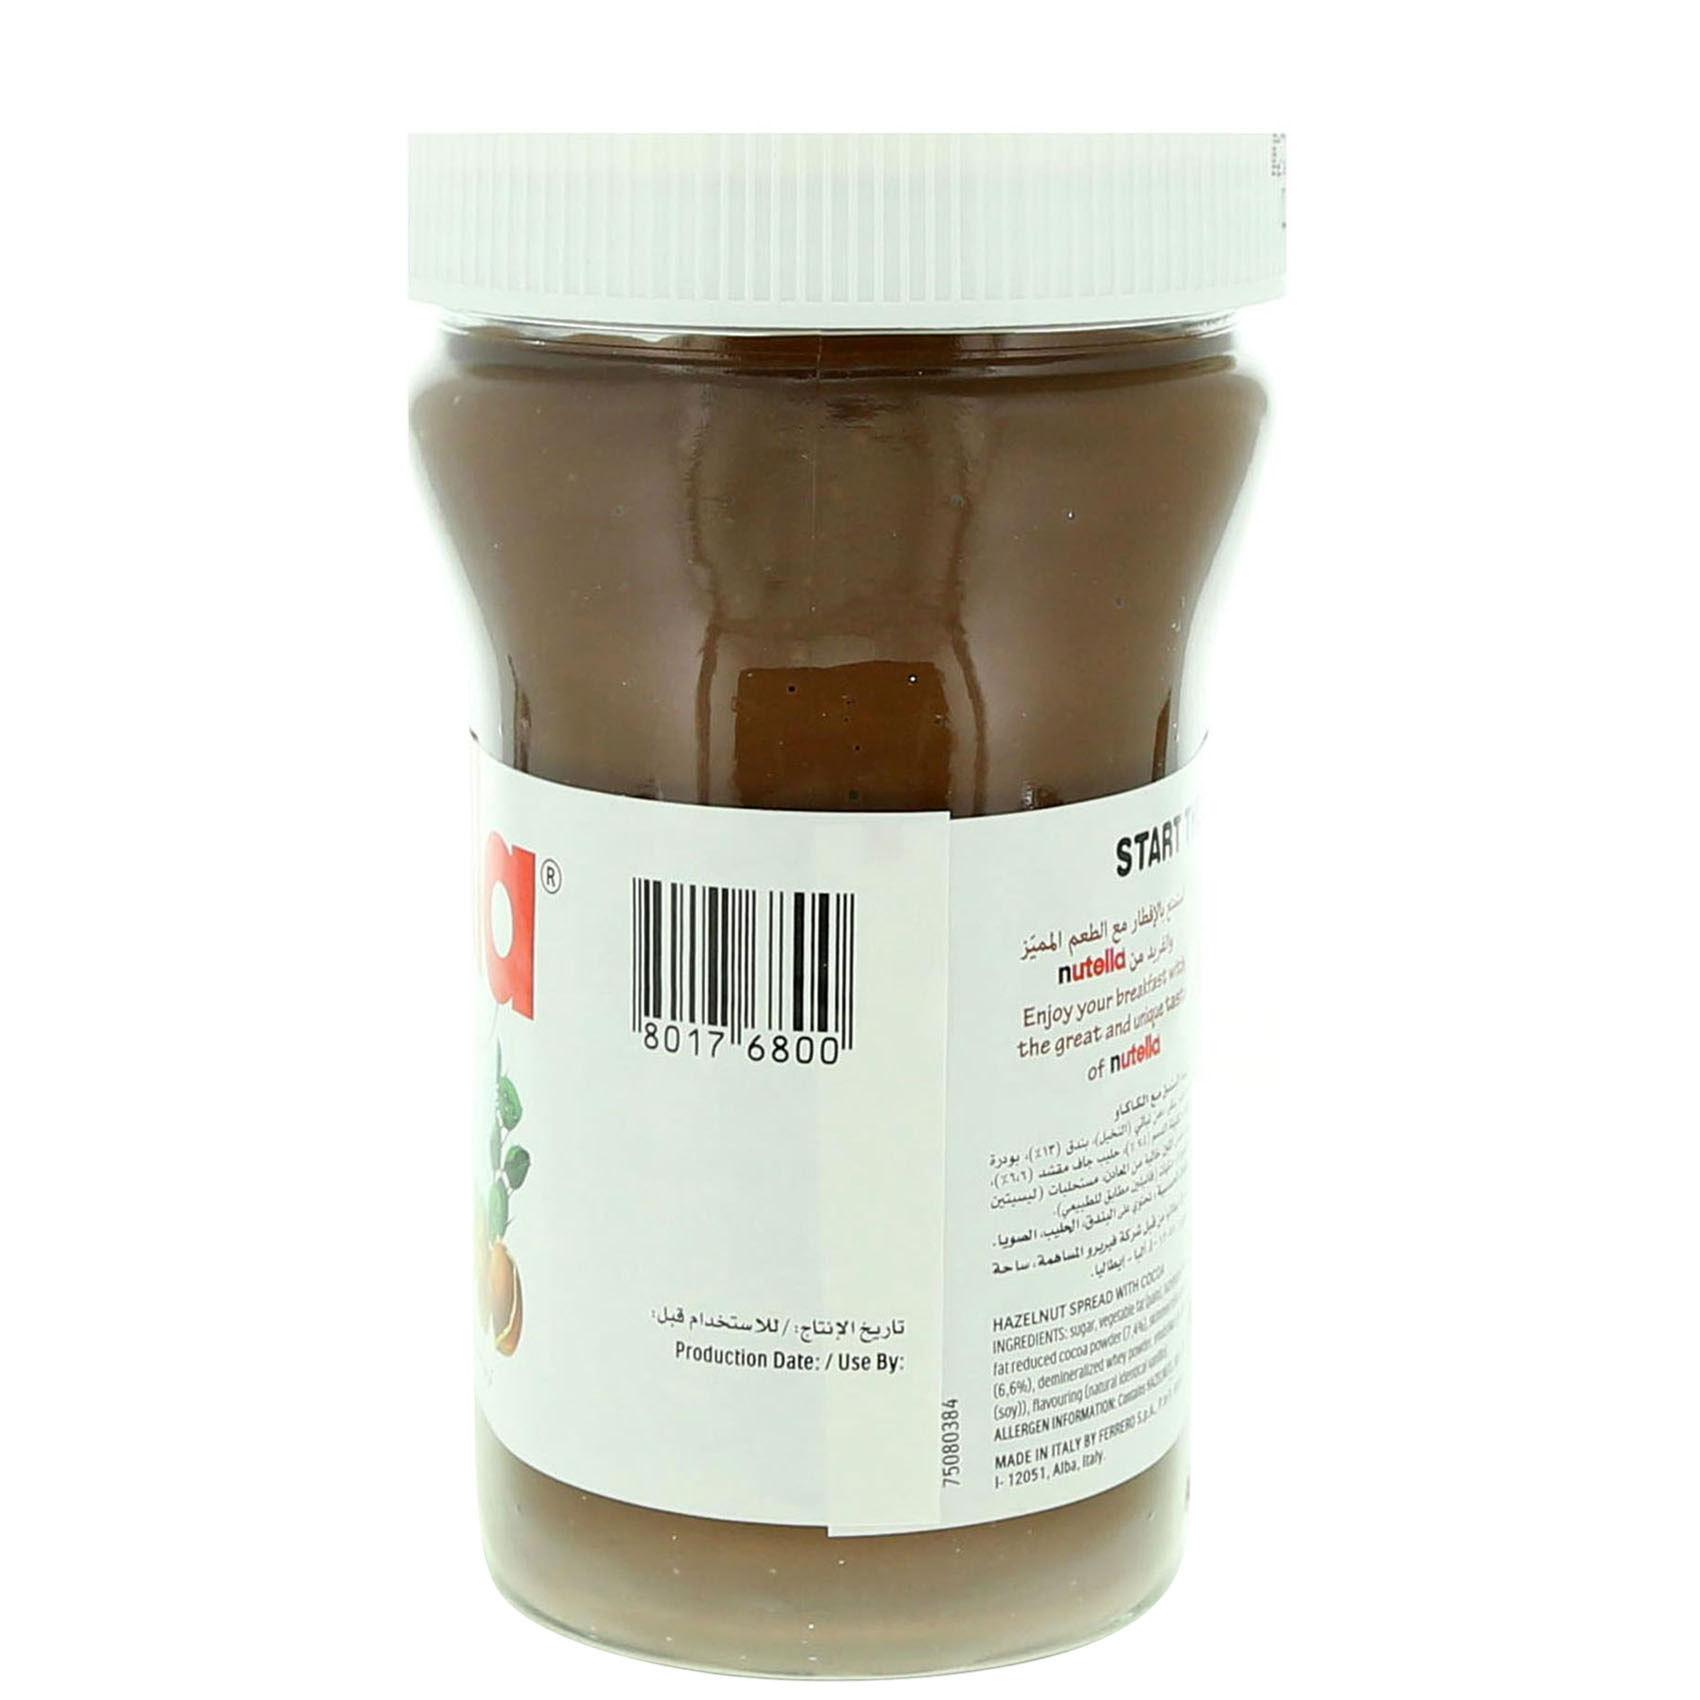 NUTELLA HAZELNUT CHOCO SPREAD 750G